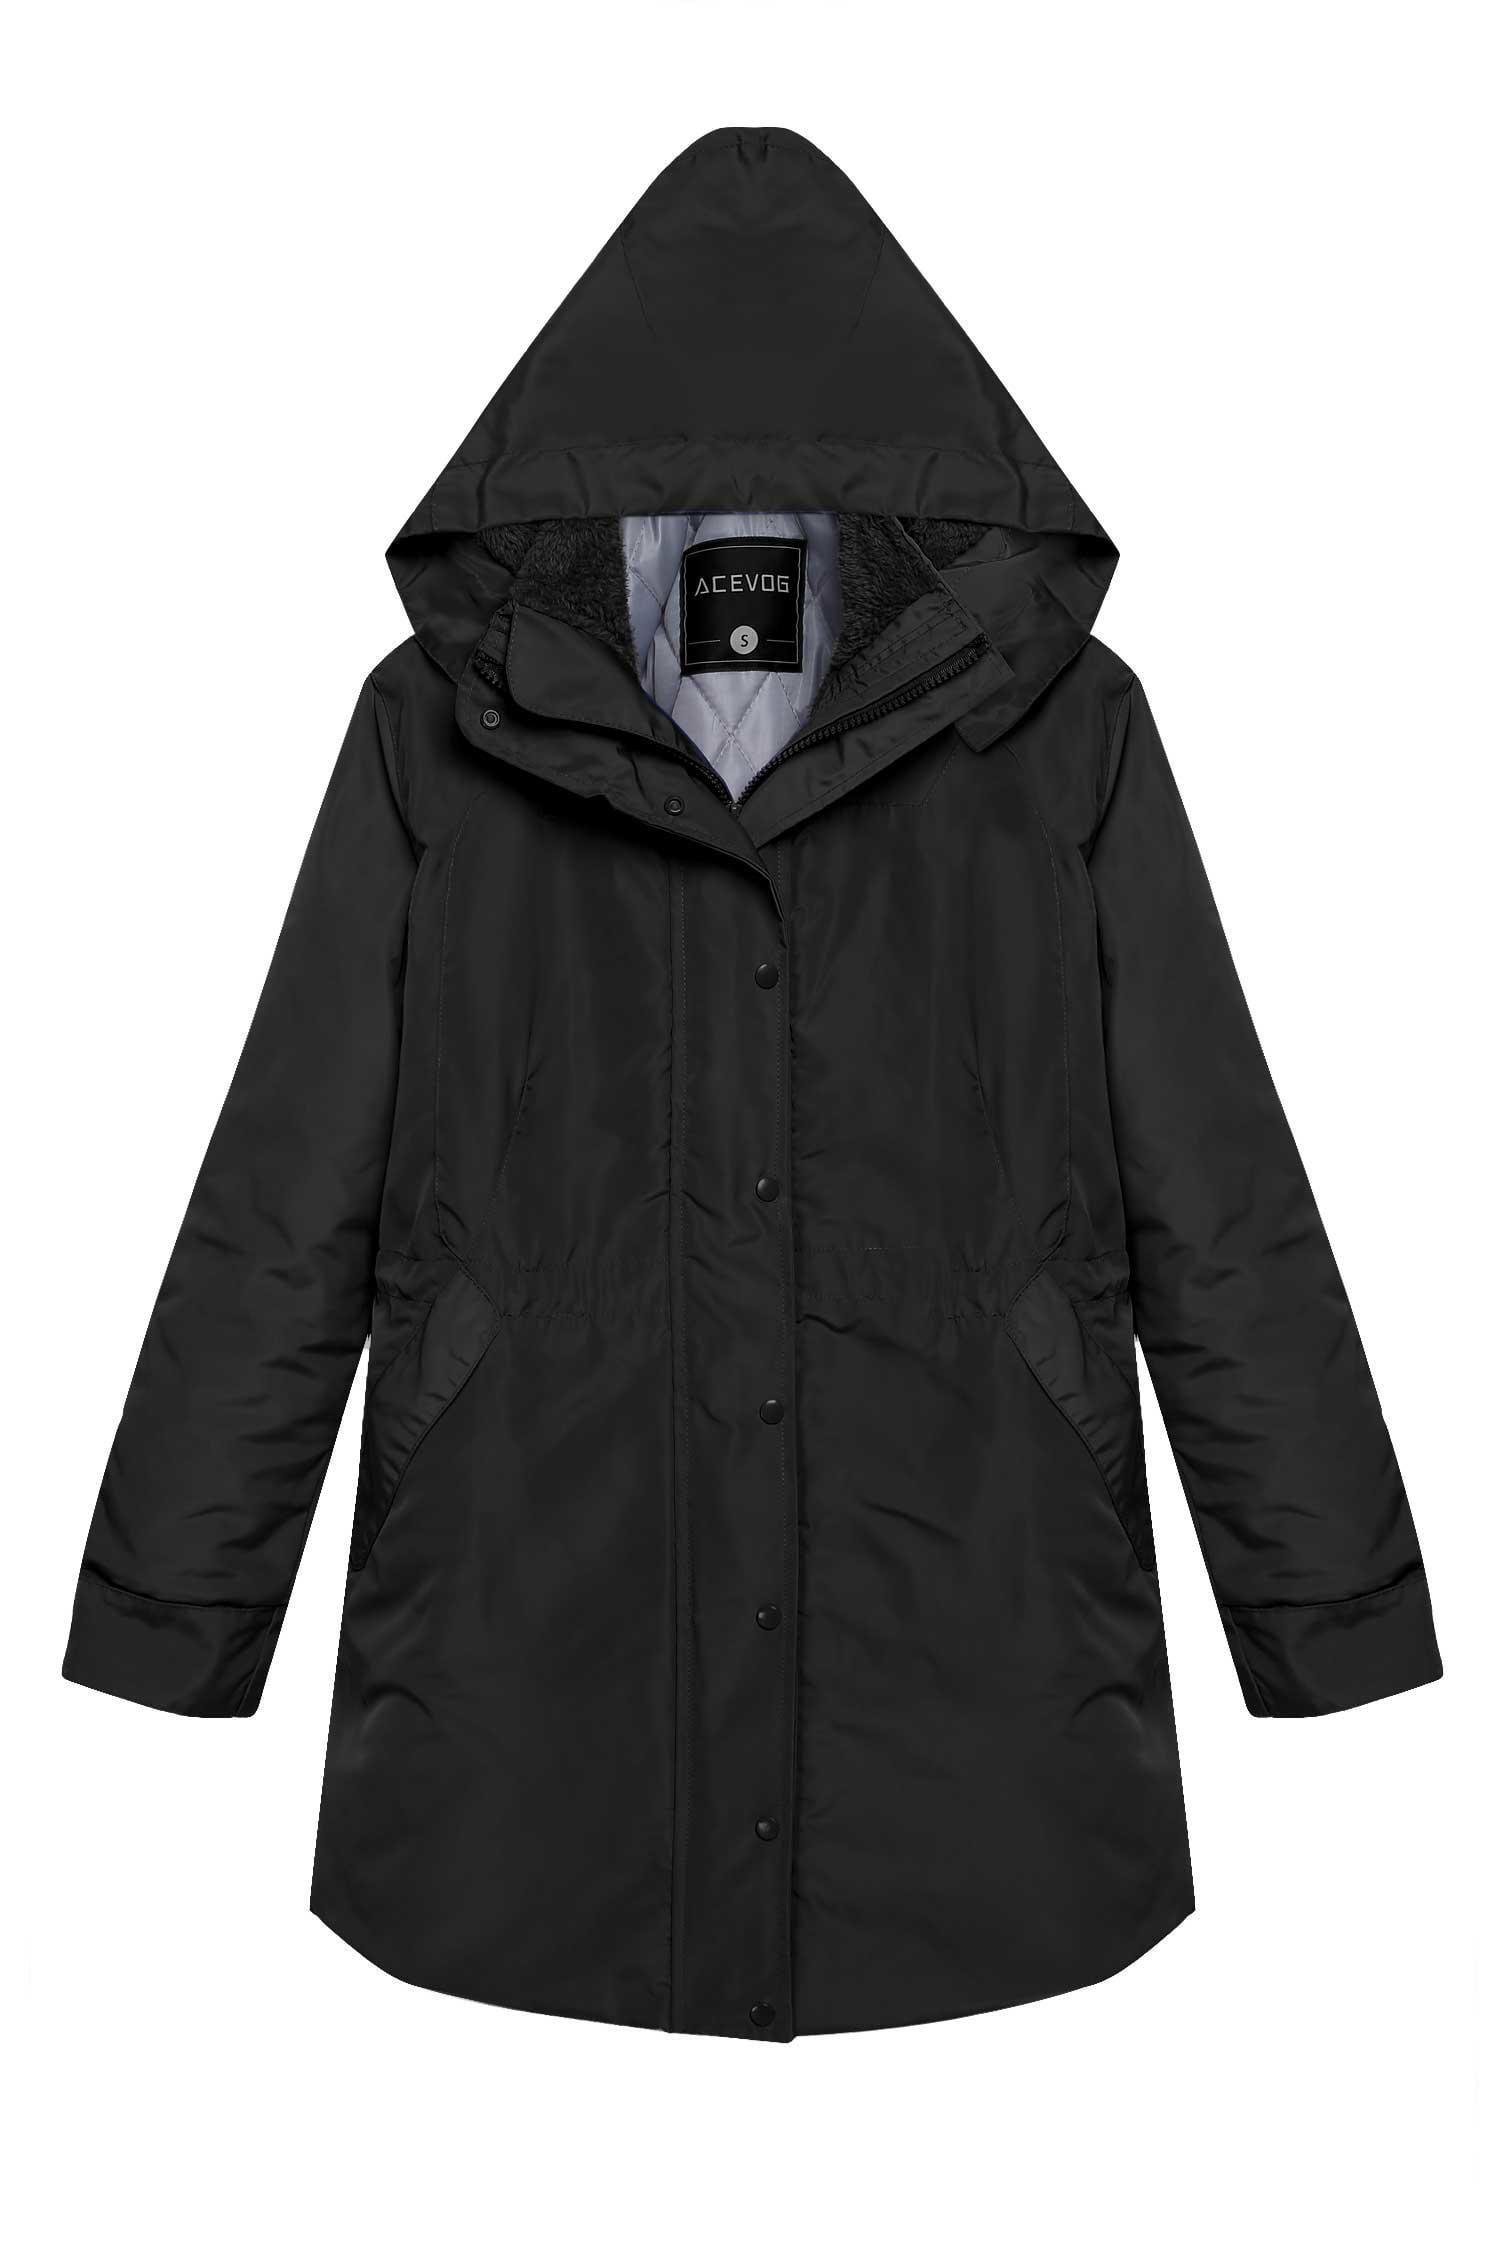 Lowest Price ever ! Women Winter Jacket Front-Zip Hooded Parka Coat Outdoor Waterproof... by